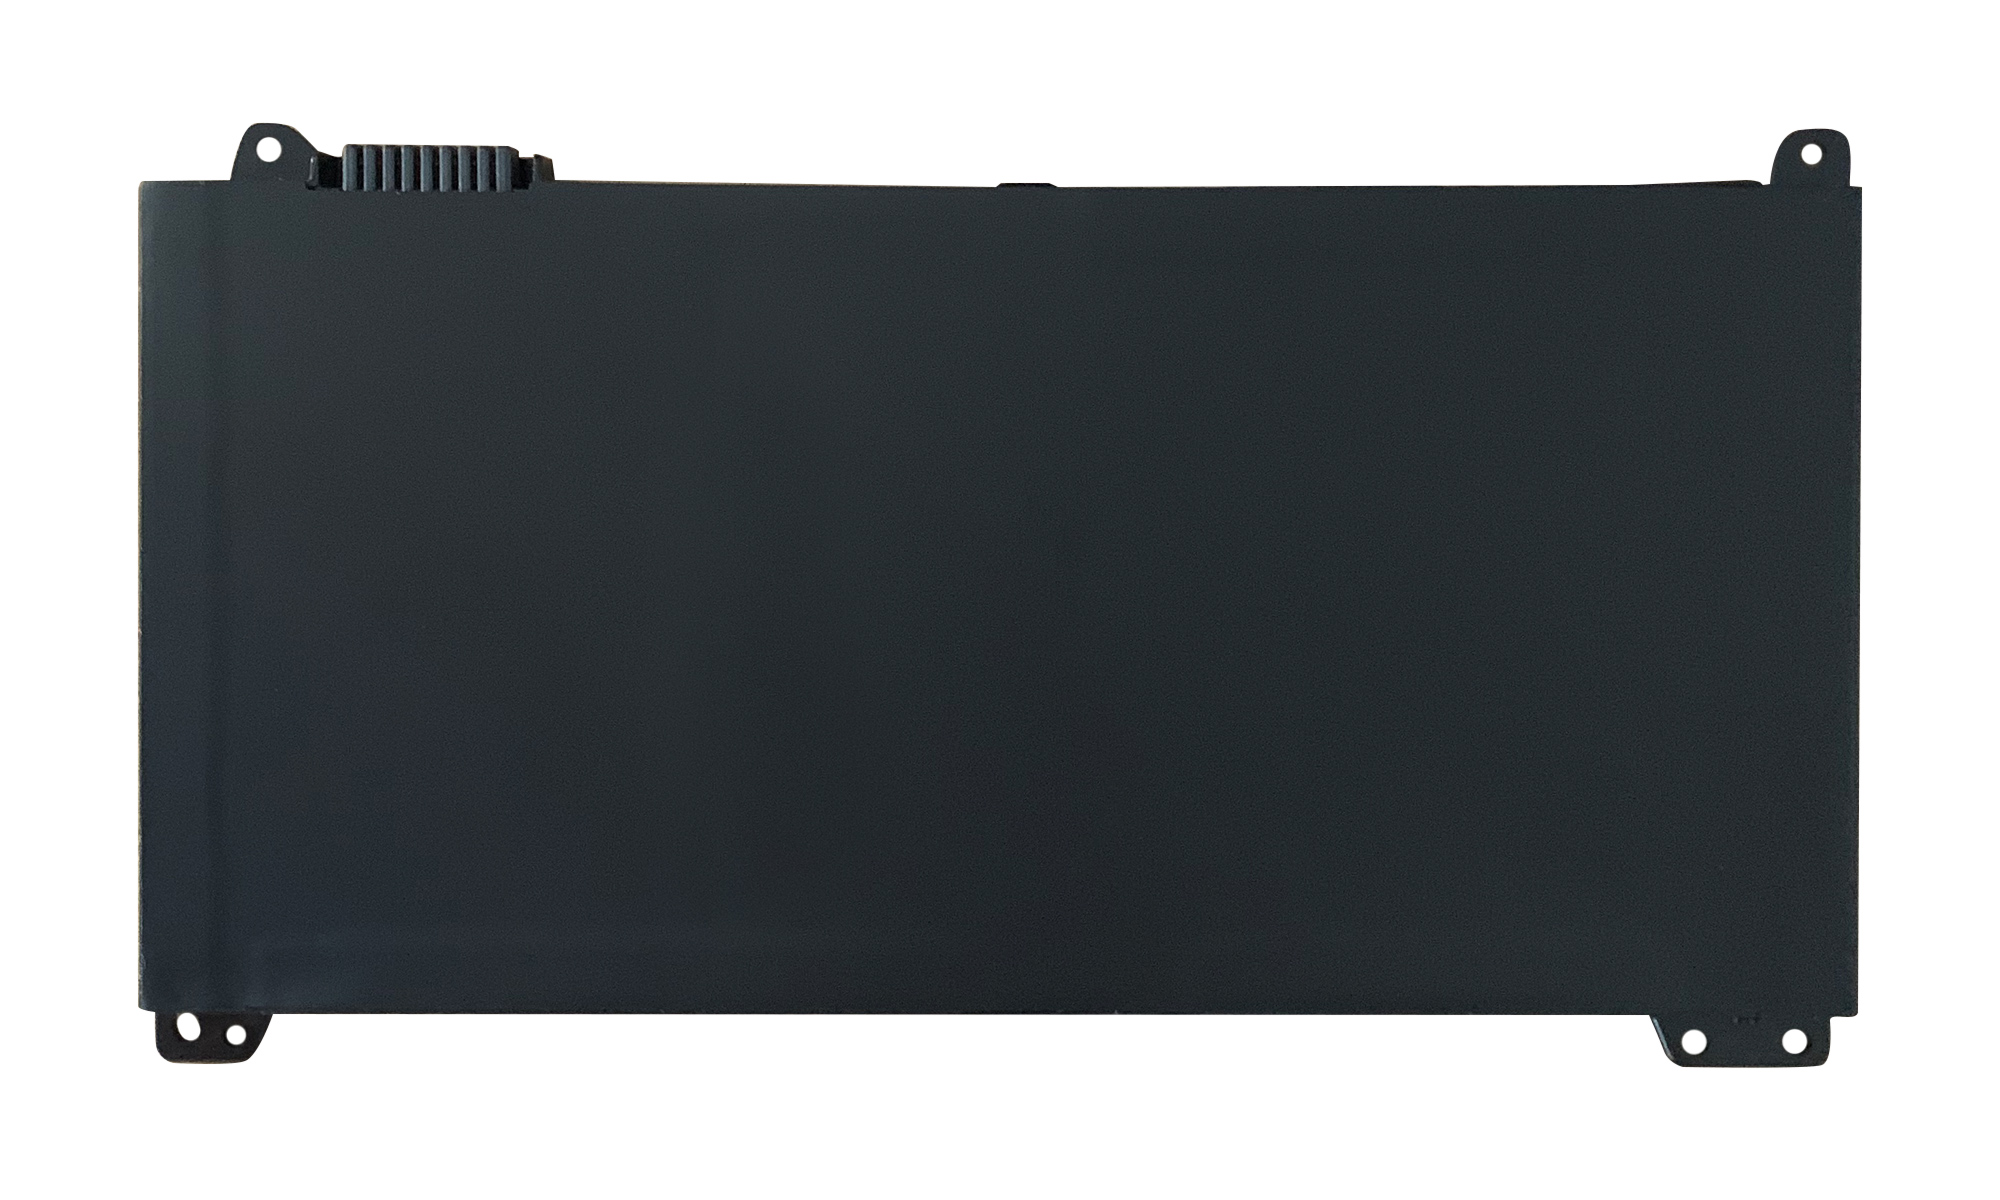 Baterie compatibila HP RR03XL, 851477-422, 851610-855, HSTNN-LB7I, HSTNN-Q01C, HSTNN-Q02C, HSTNN-Q03C, HSTNN-Q04C, HSTNN-Q06C